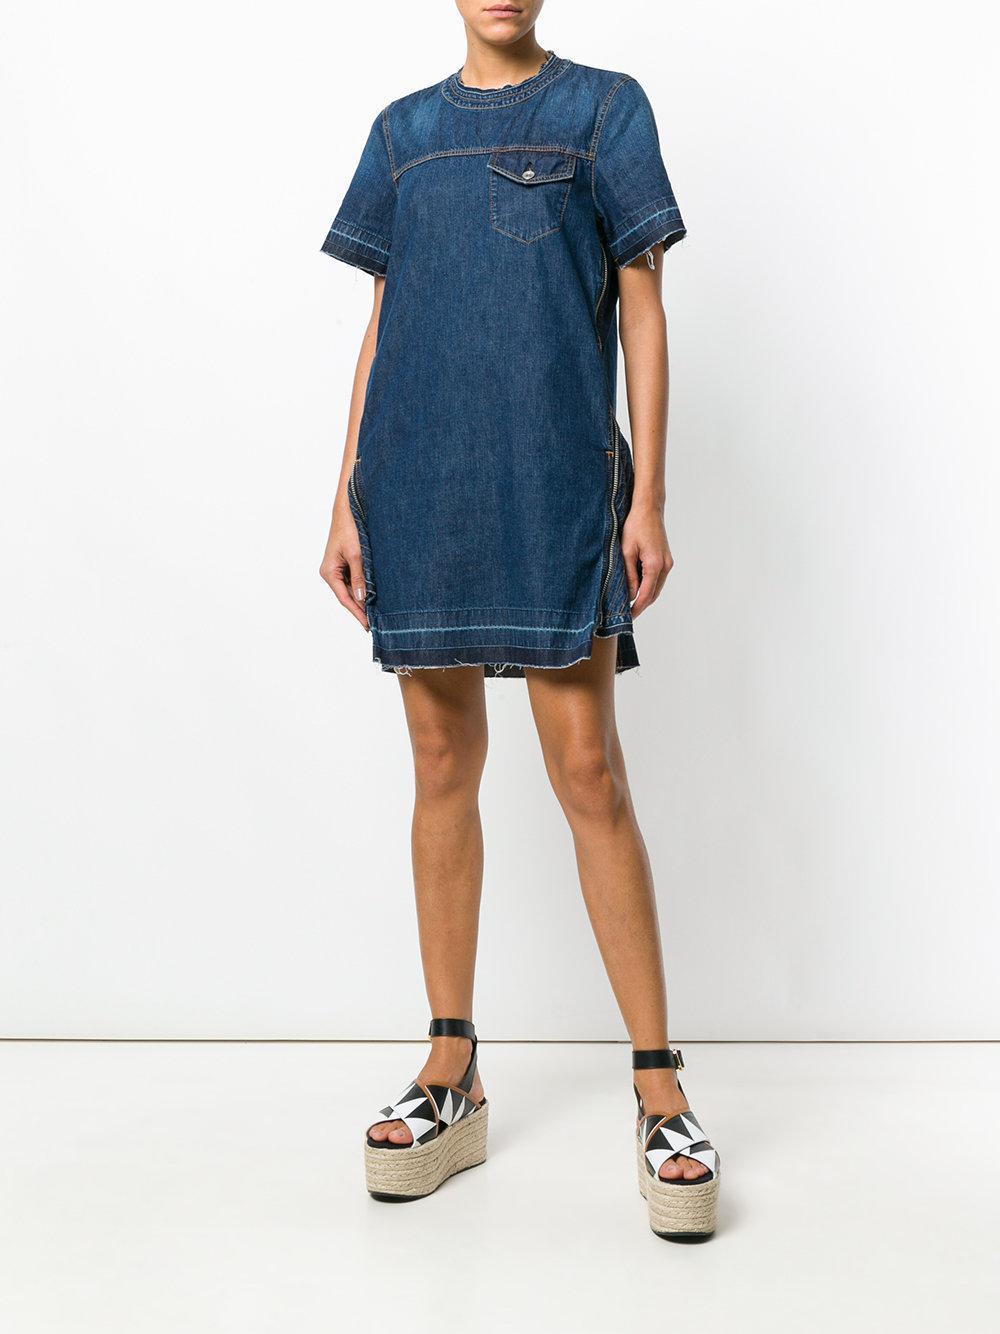 56e6e1855c Lyst - Sacai Denim Zip Embellished Dress in Blue - Save 58%